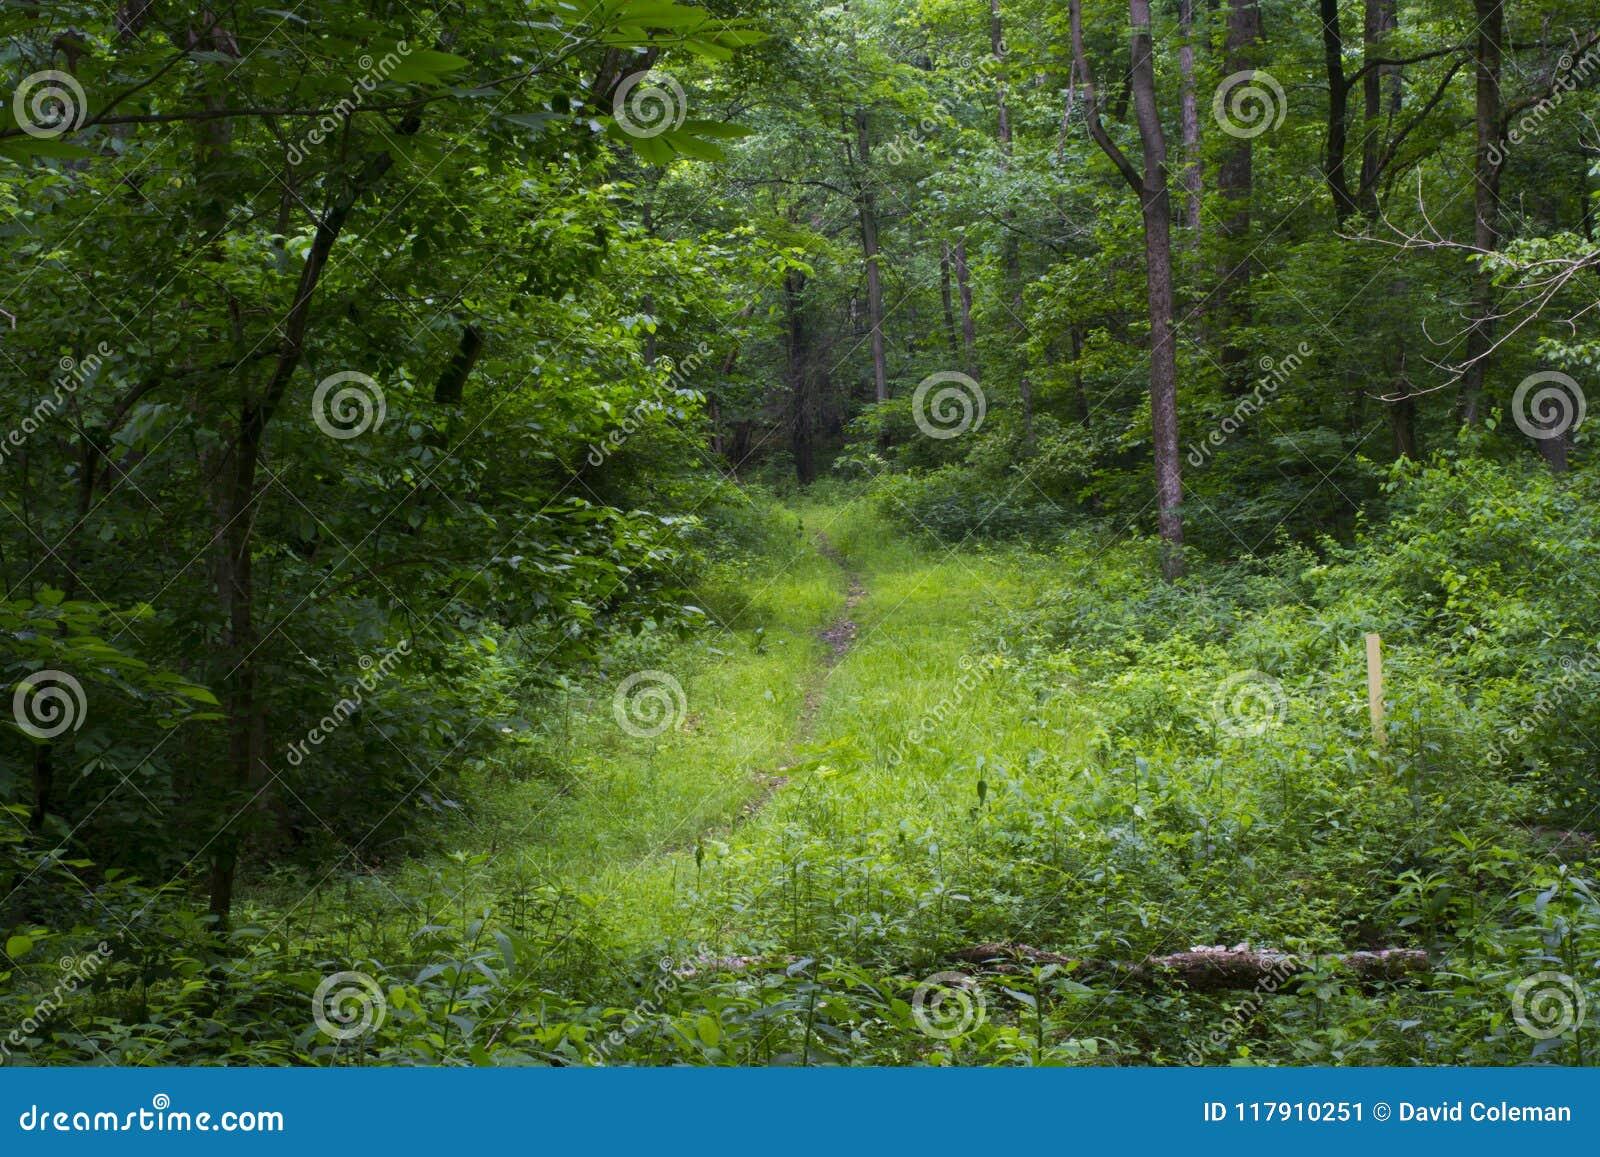 Hiking path through dense forest